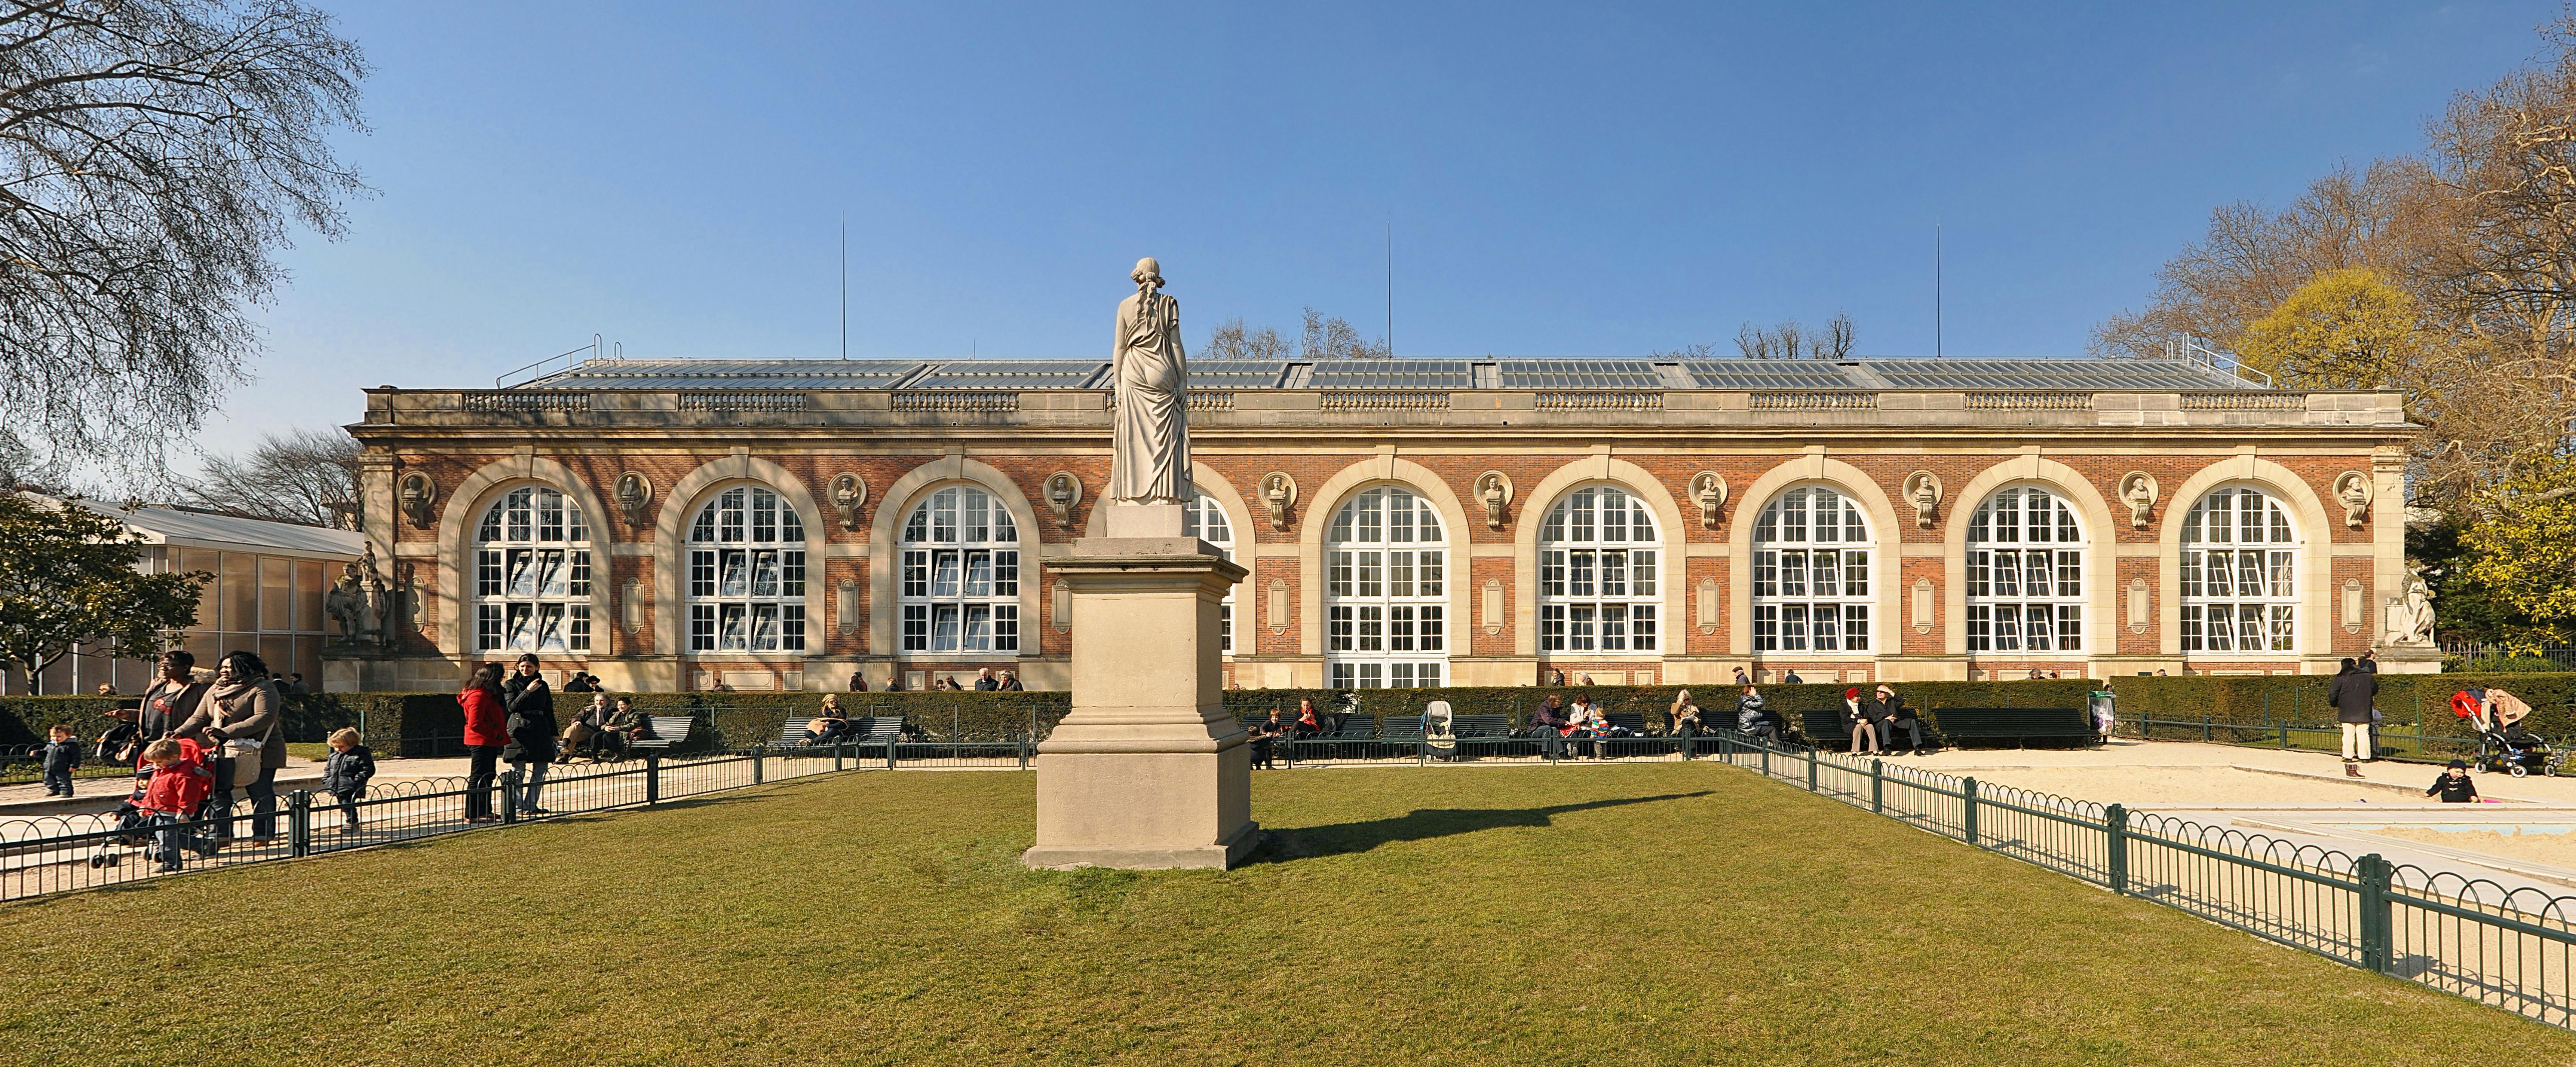 File orangerie du jardin du luxembourg paris for Jardin paris